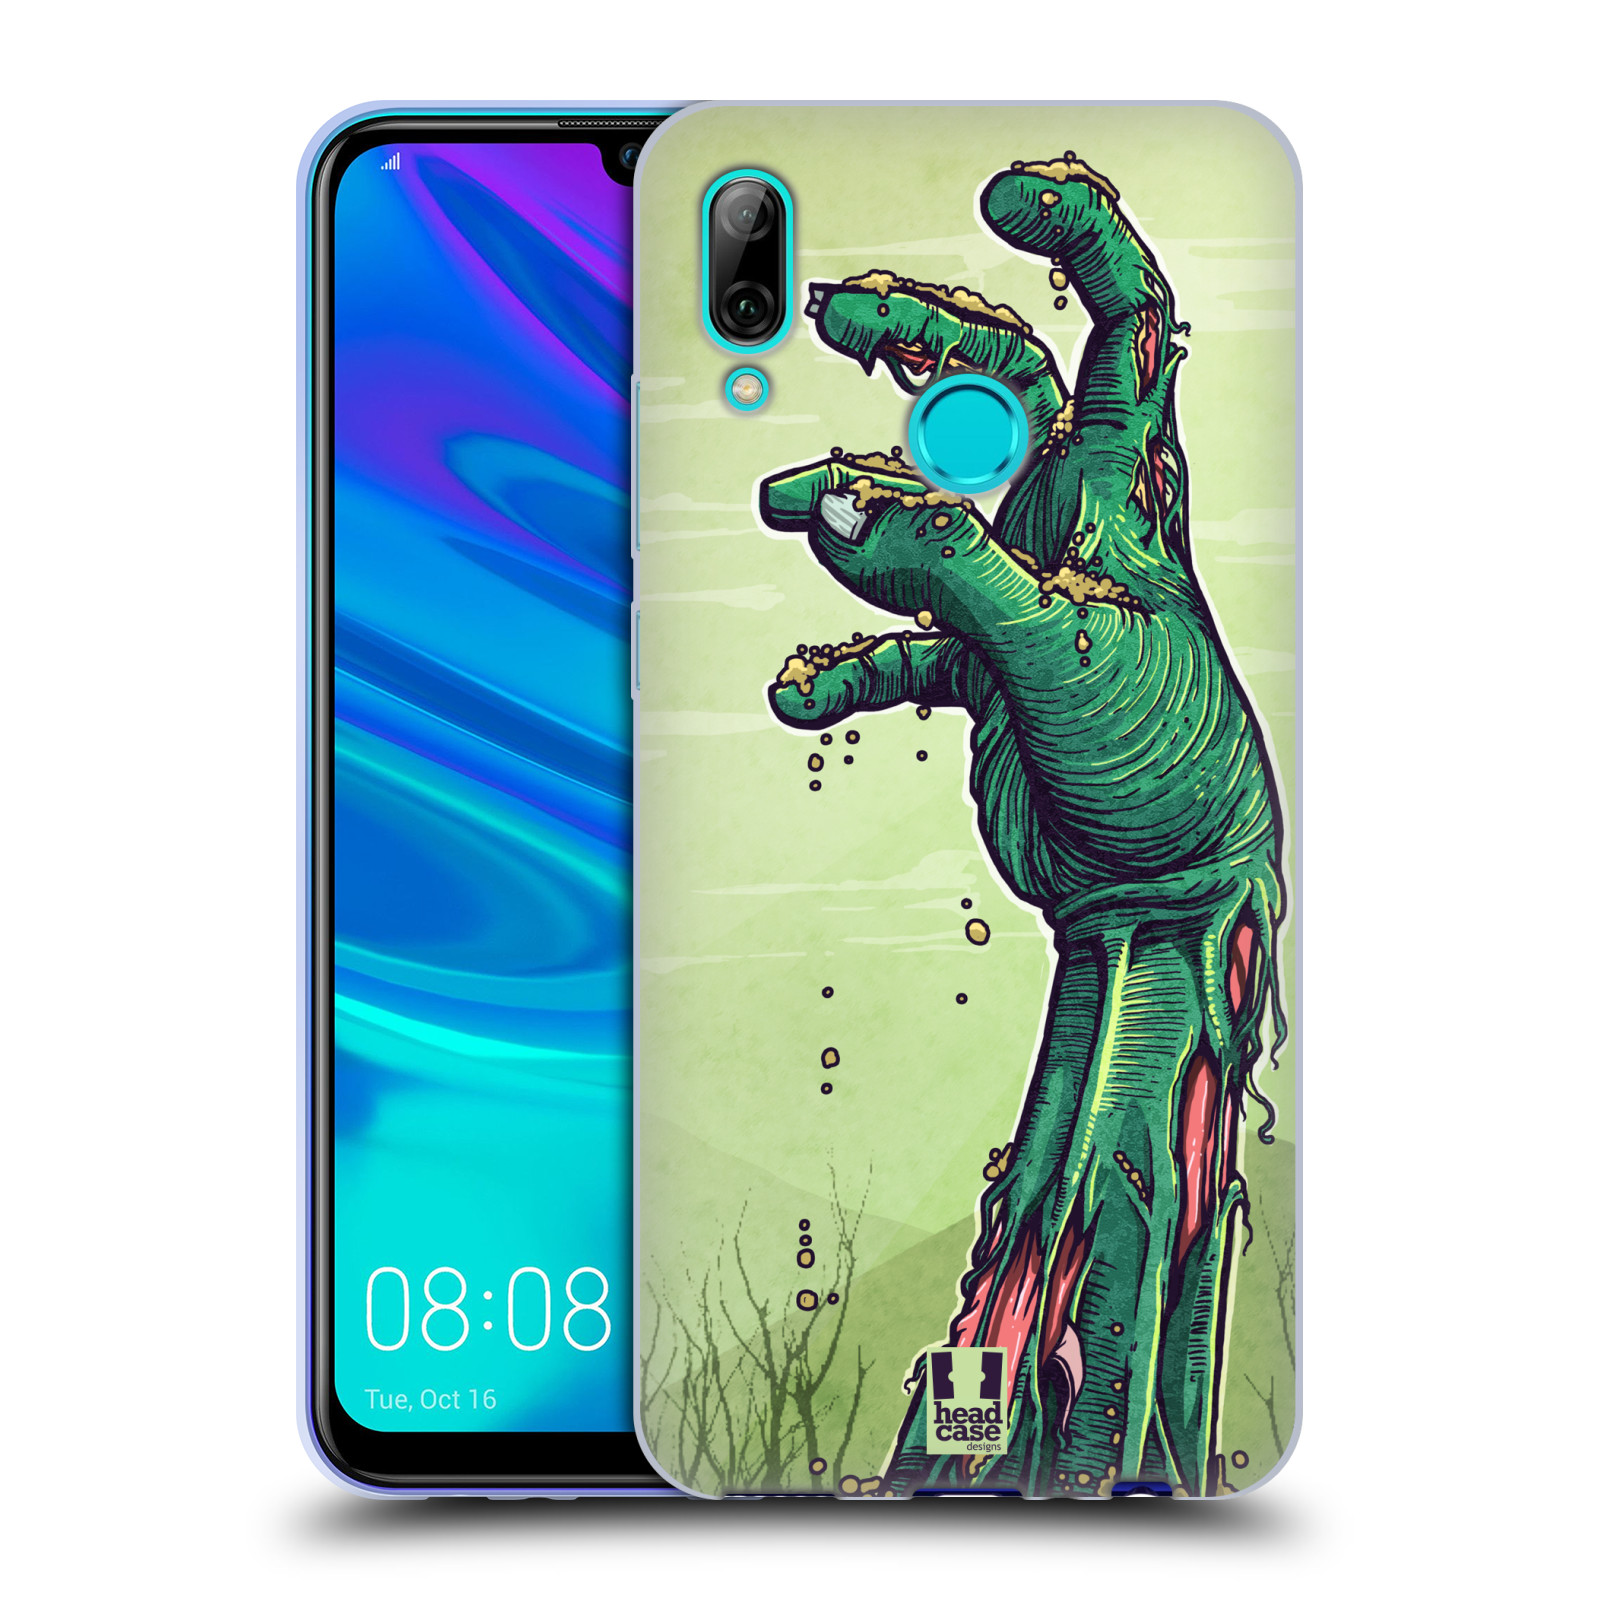 Silikonové pouzdro na mobil Huawei P Smart (2019) - Head Case - ZOMBIE RUKA